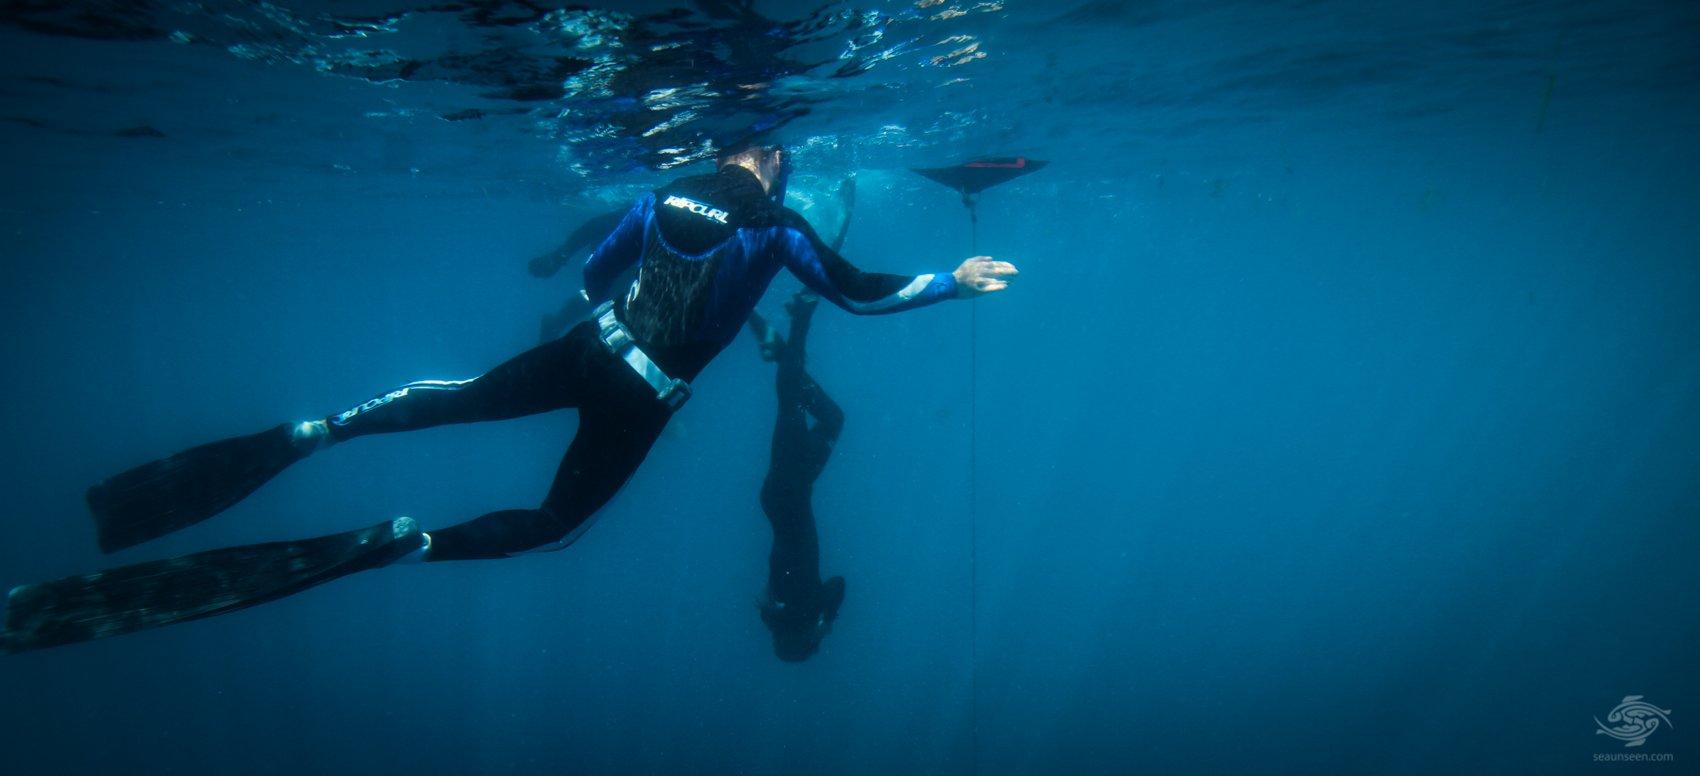 Apnea Academy Freediving Dar es Salaam Tanzania82-swm